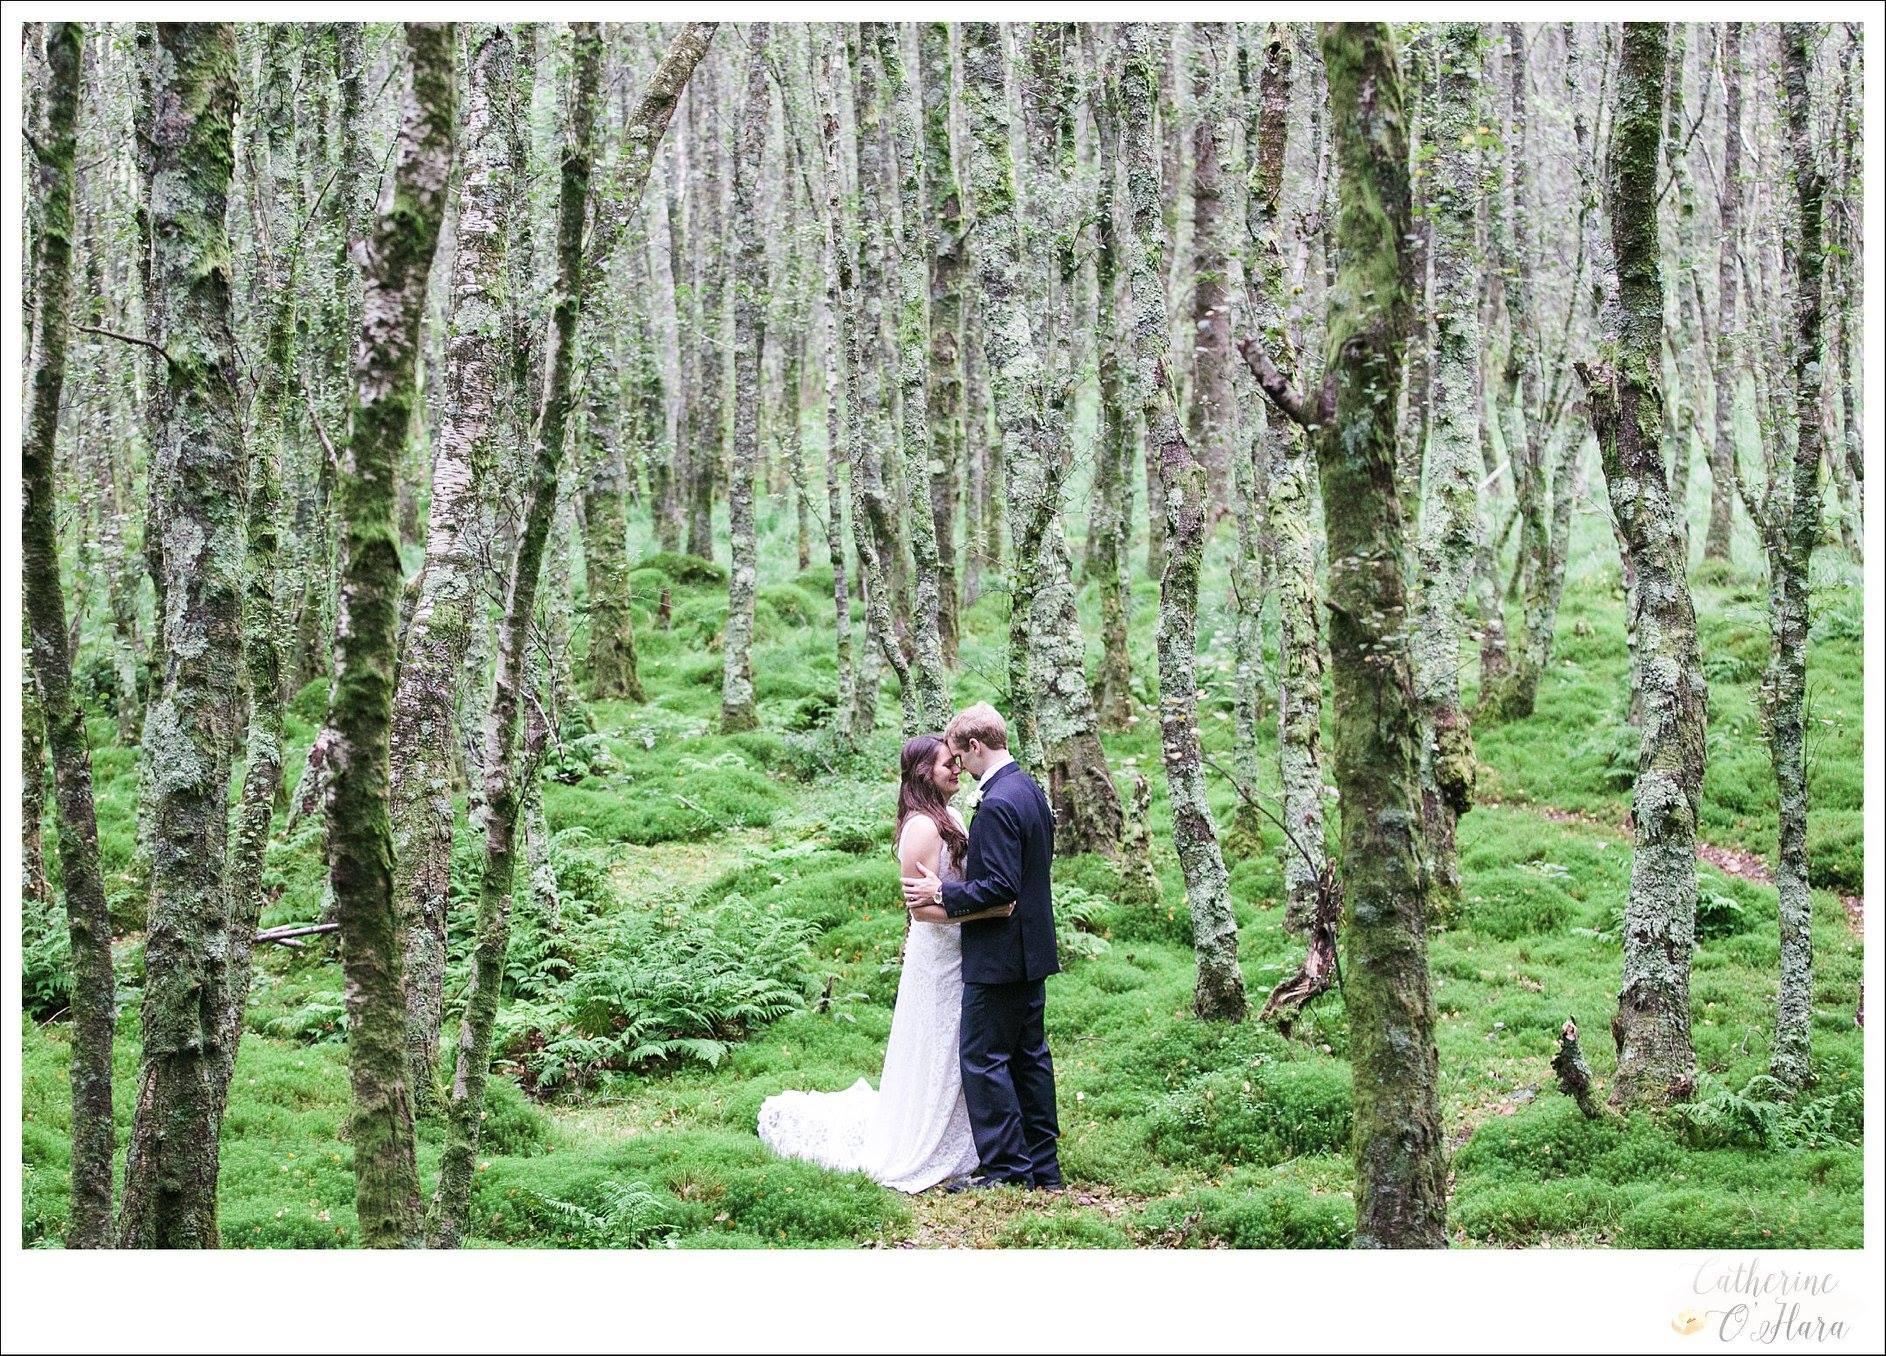 english speaking  elope paris france wedding photographer.jpg.jpg